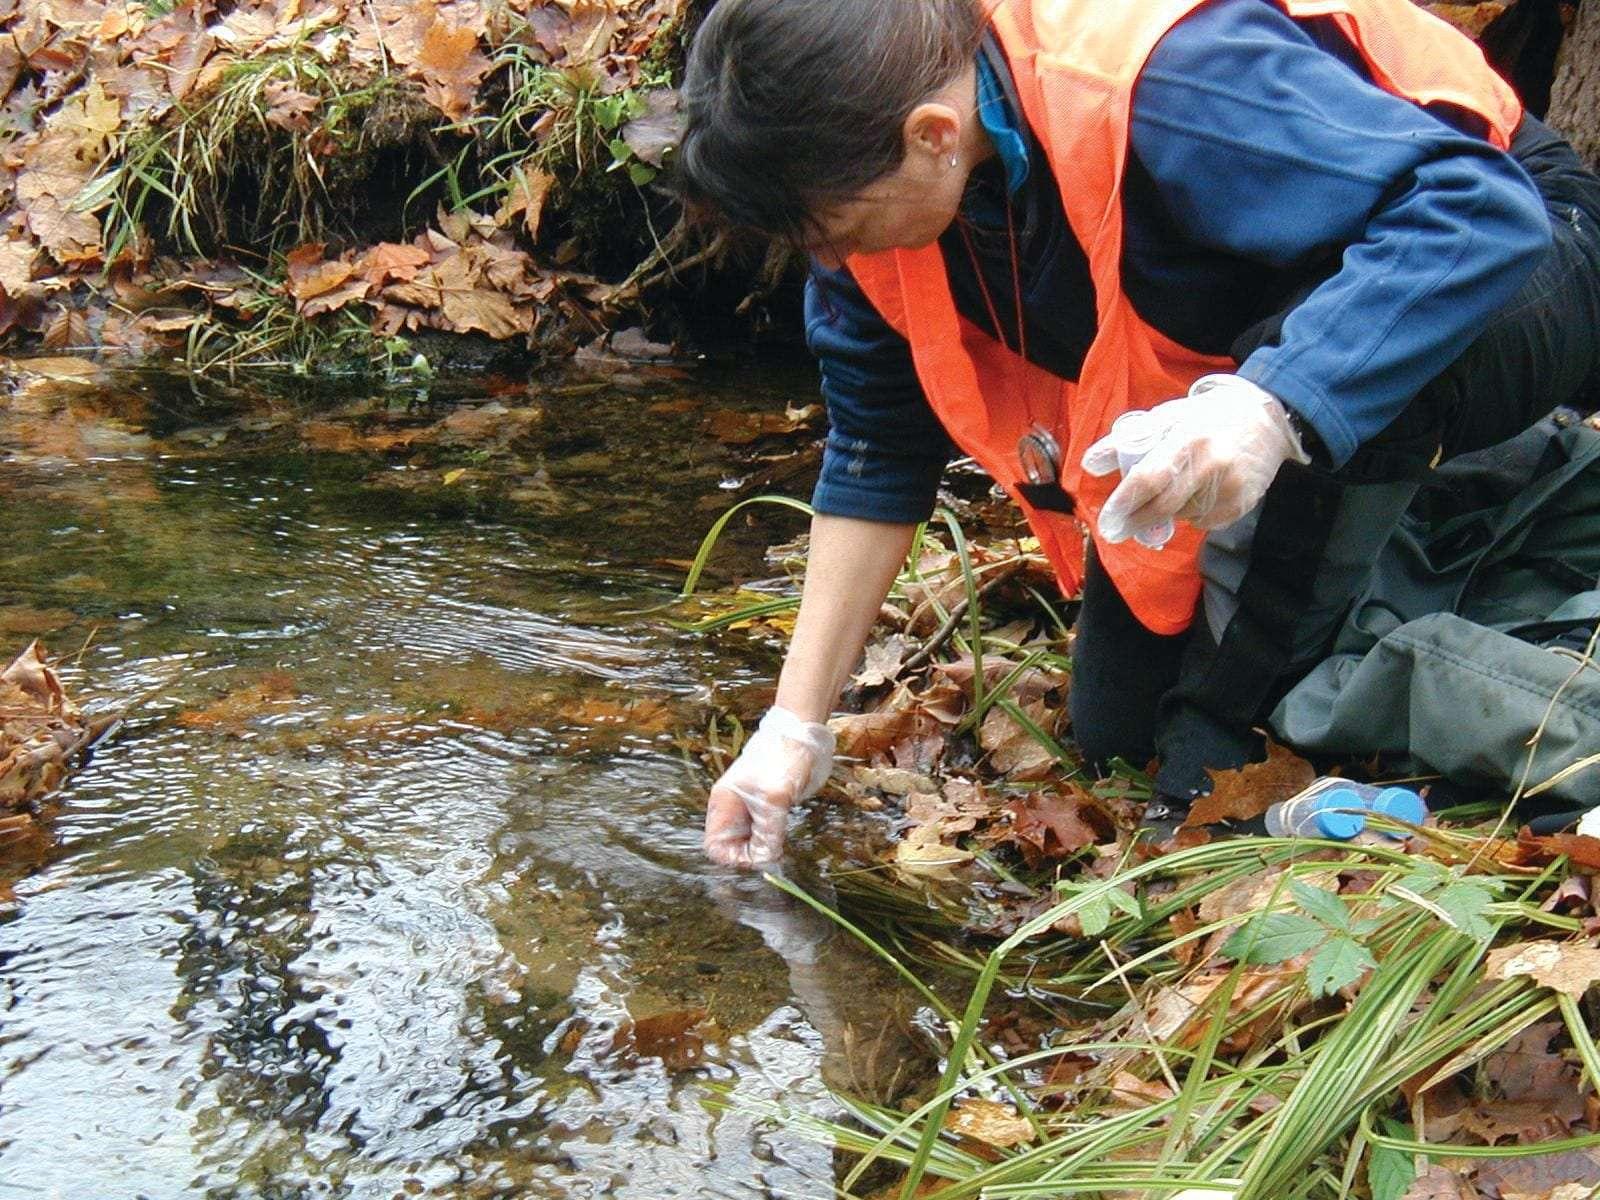 Western Adirondack Stream Survey